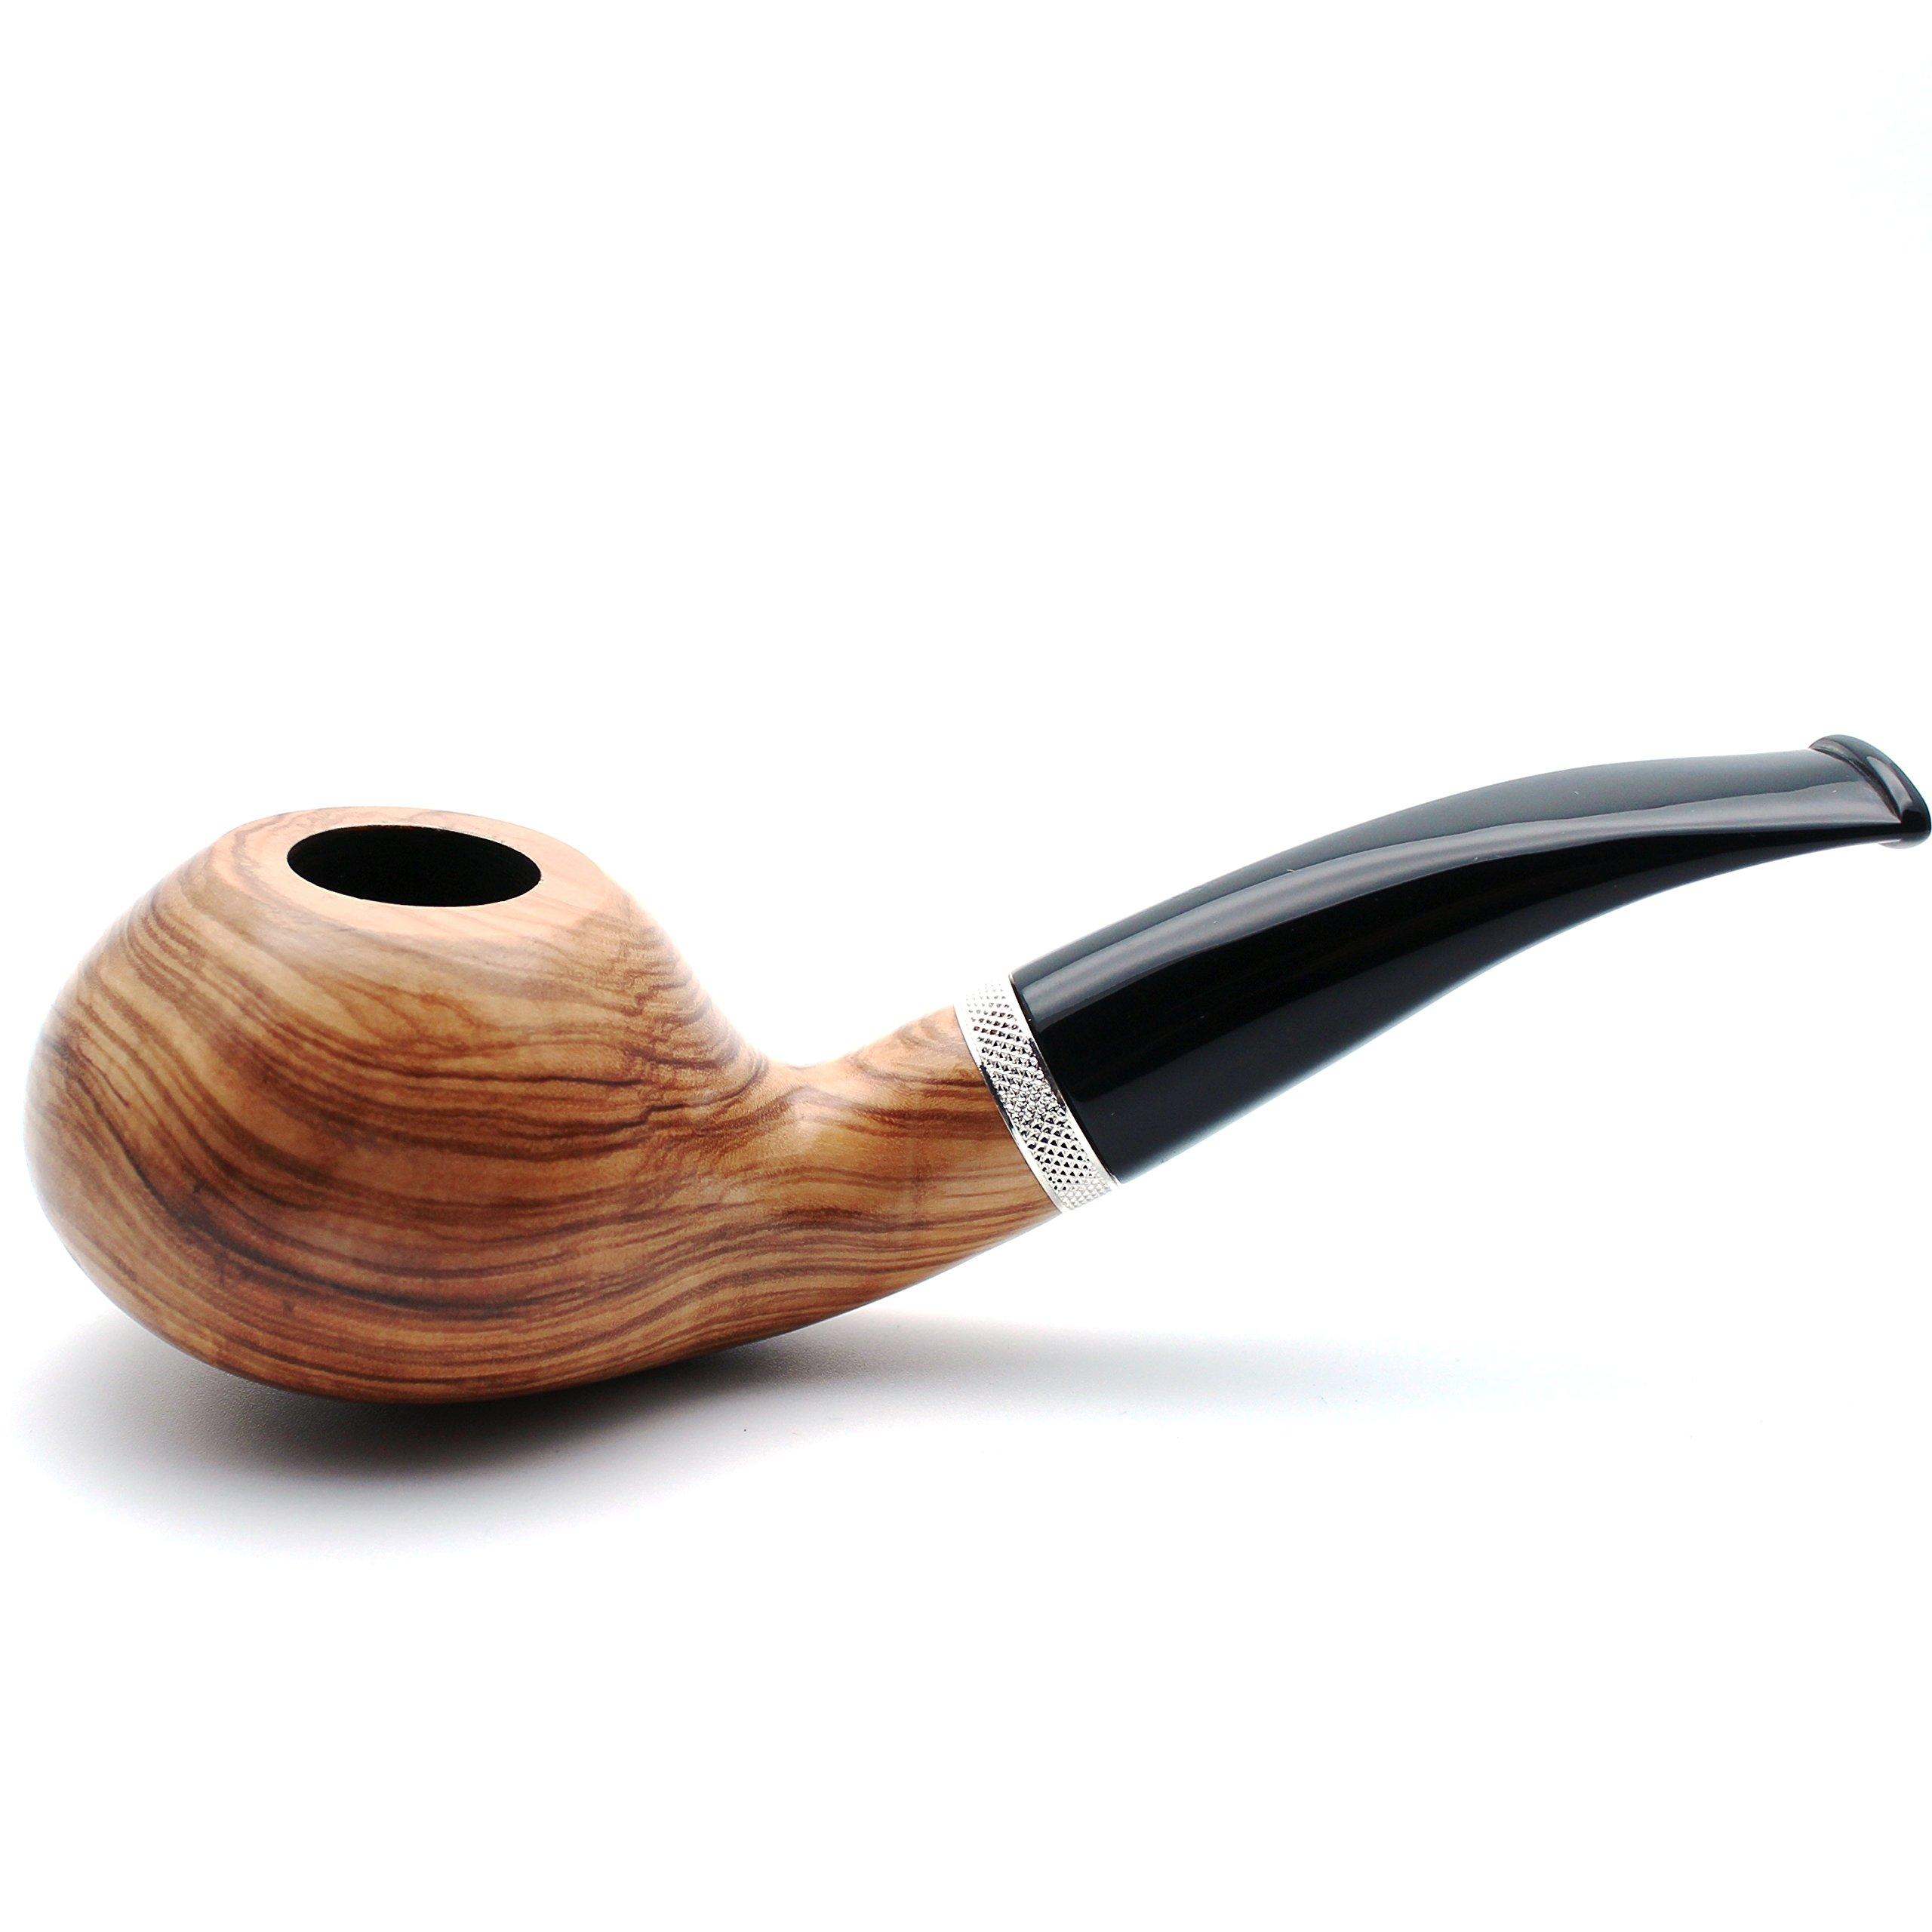 Mr. Brog Handmade Smoking Tobacco Pipe - Model No. 148 Pebble Natural - Italian Olive Wood